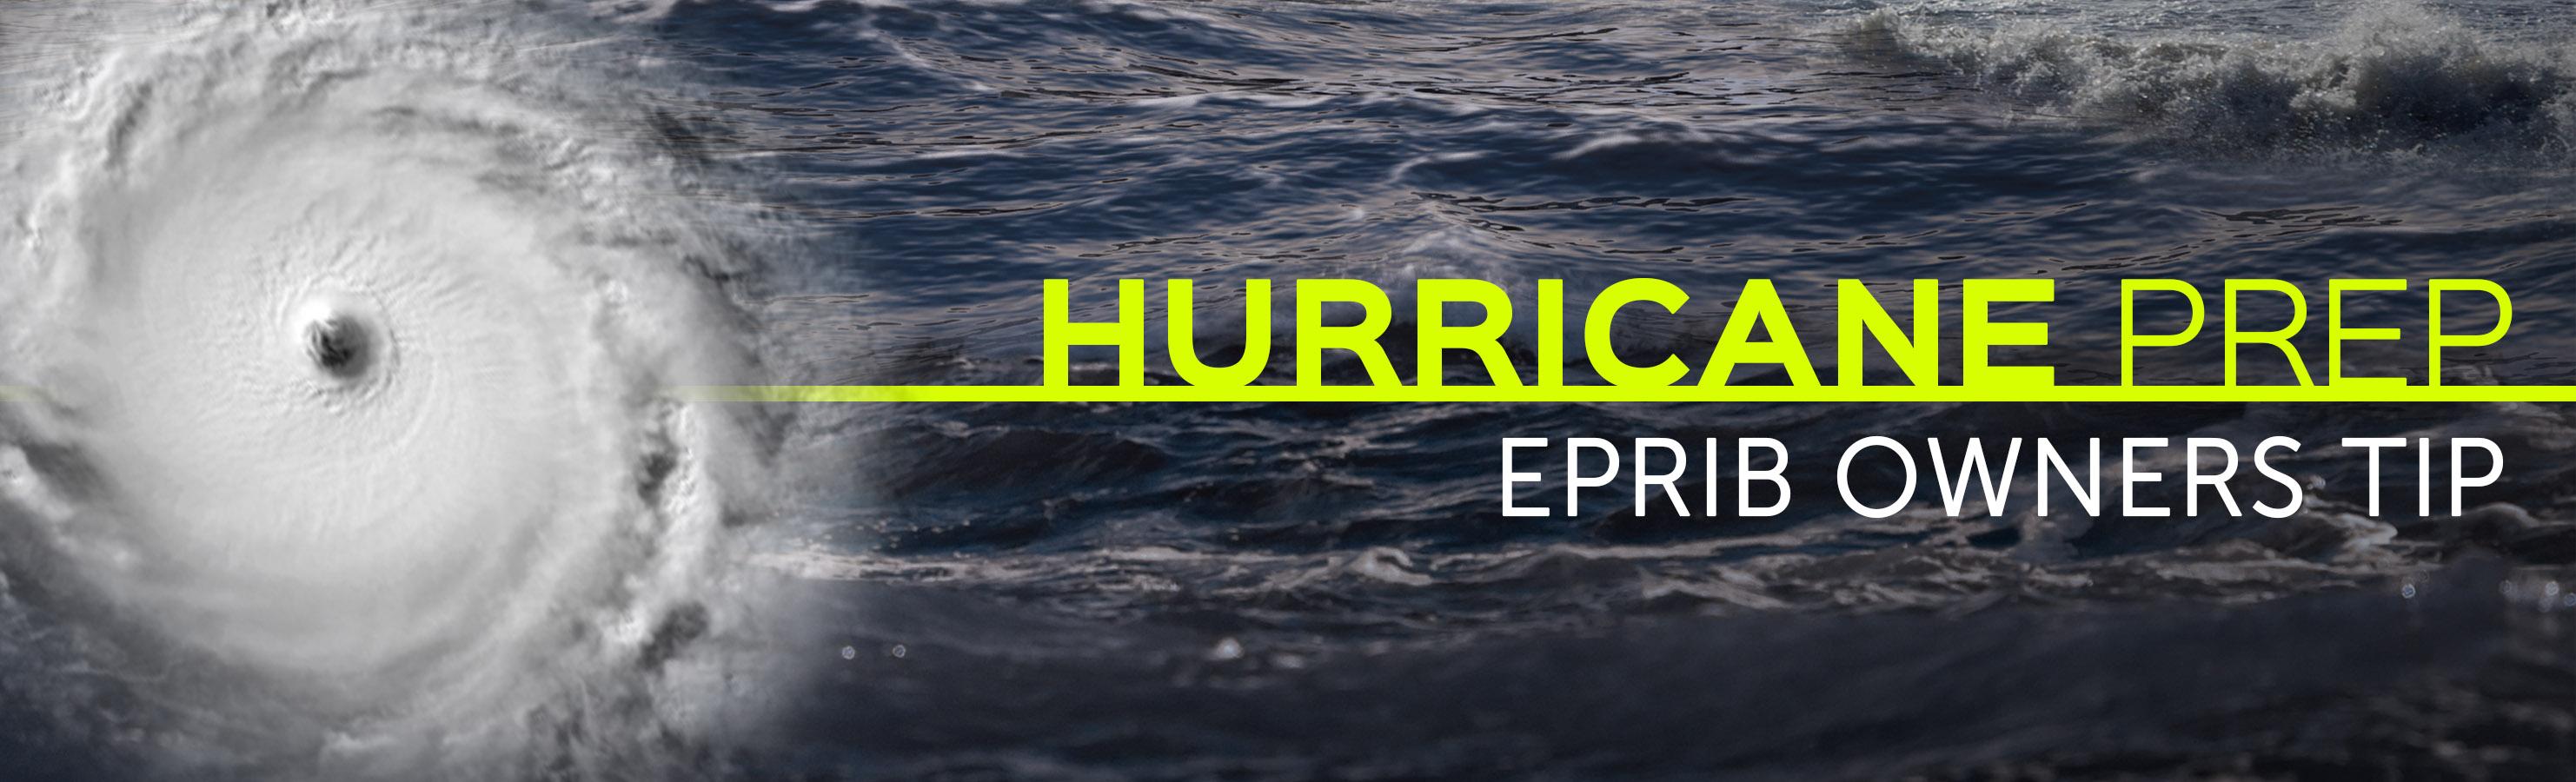 Acr   hurricane prep   epirb owners   lead